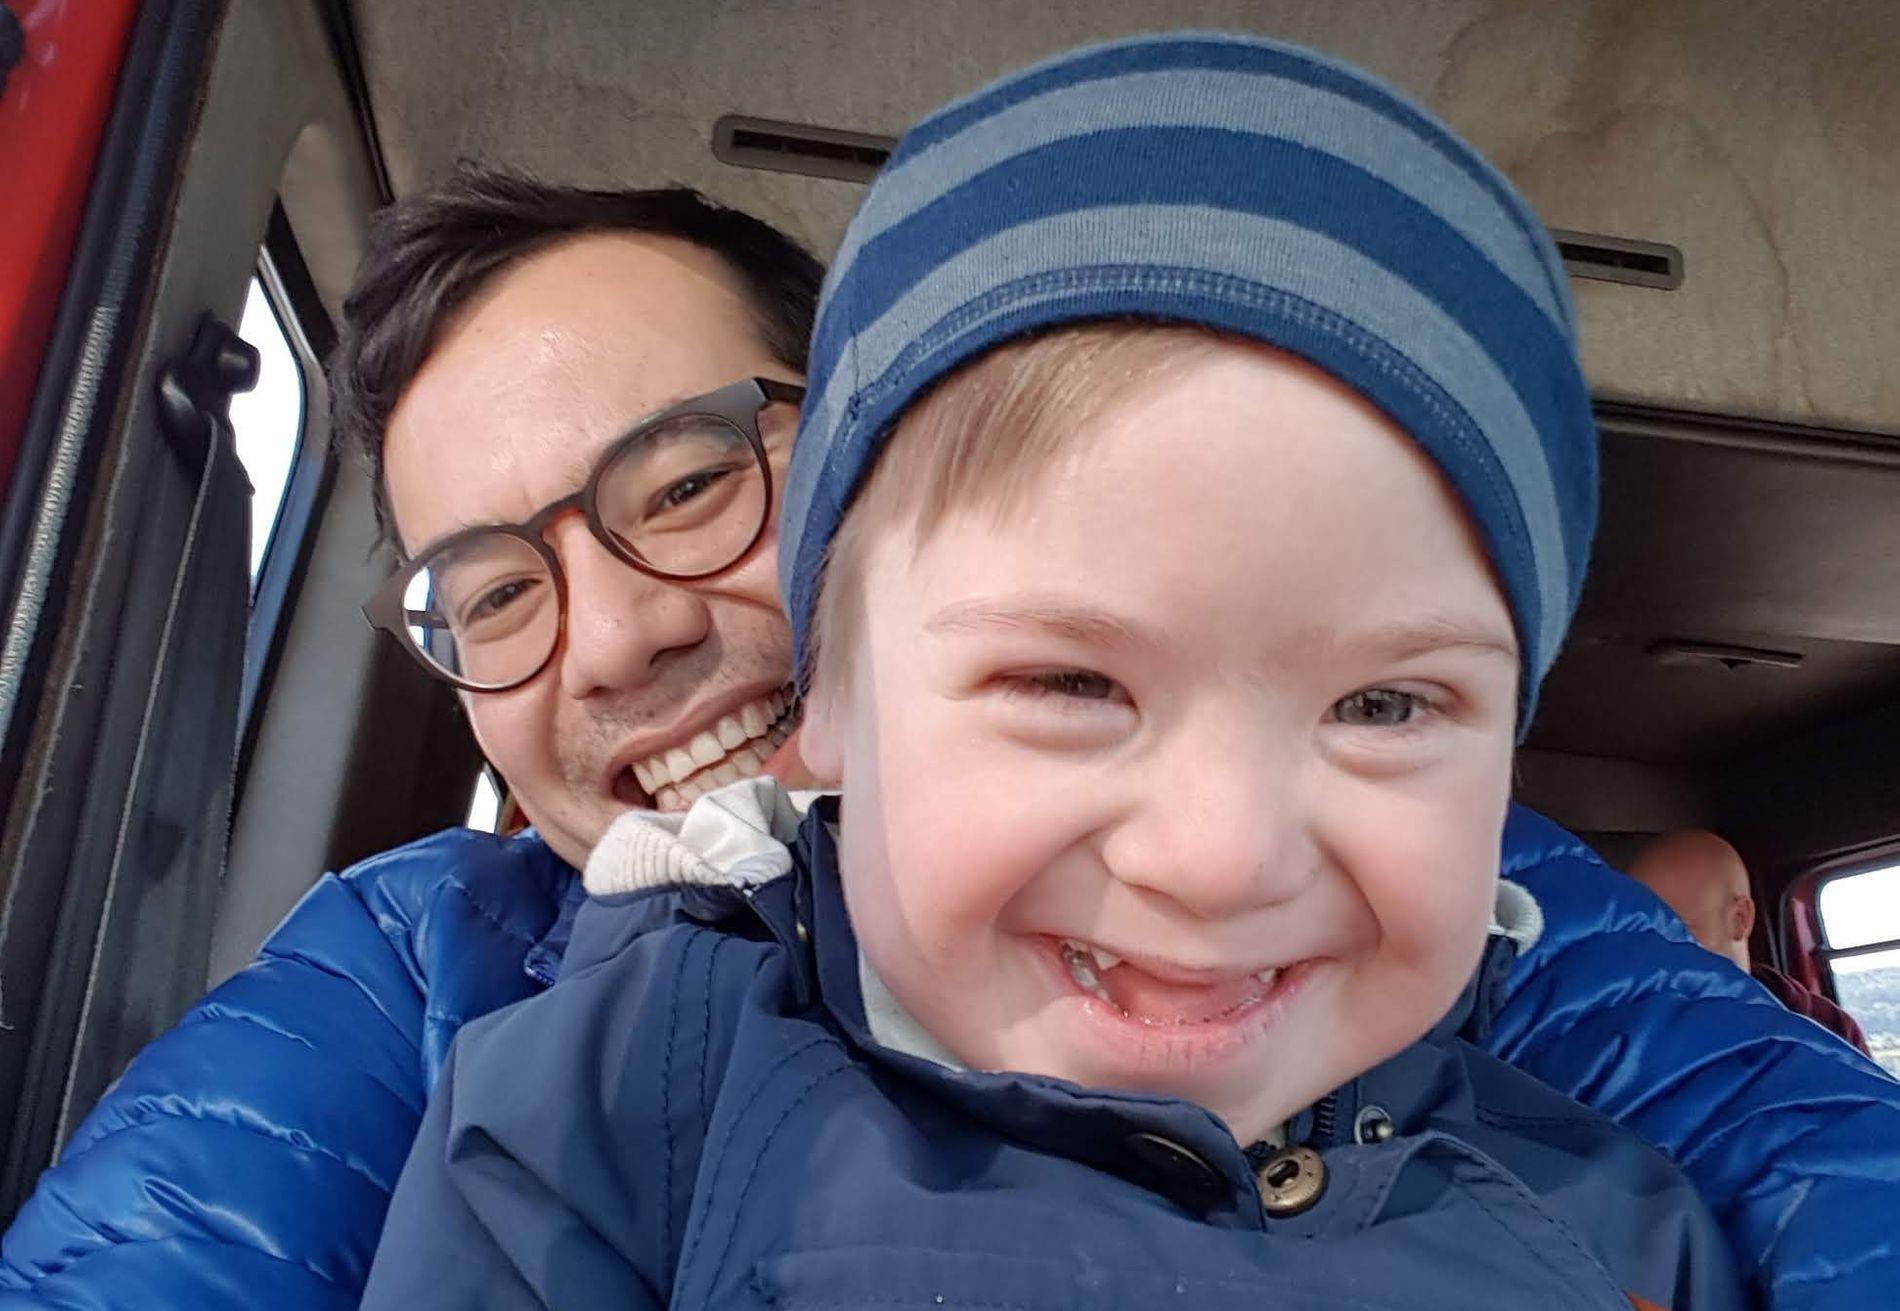 REAGERER: – Når abortloven diskuteres får som regel Downs syndrom en uforholdsmessig stor rolle, skriver Jan Inge Kvamme. Her sammen med sønnen Syver (5), som har Downs syndrom.